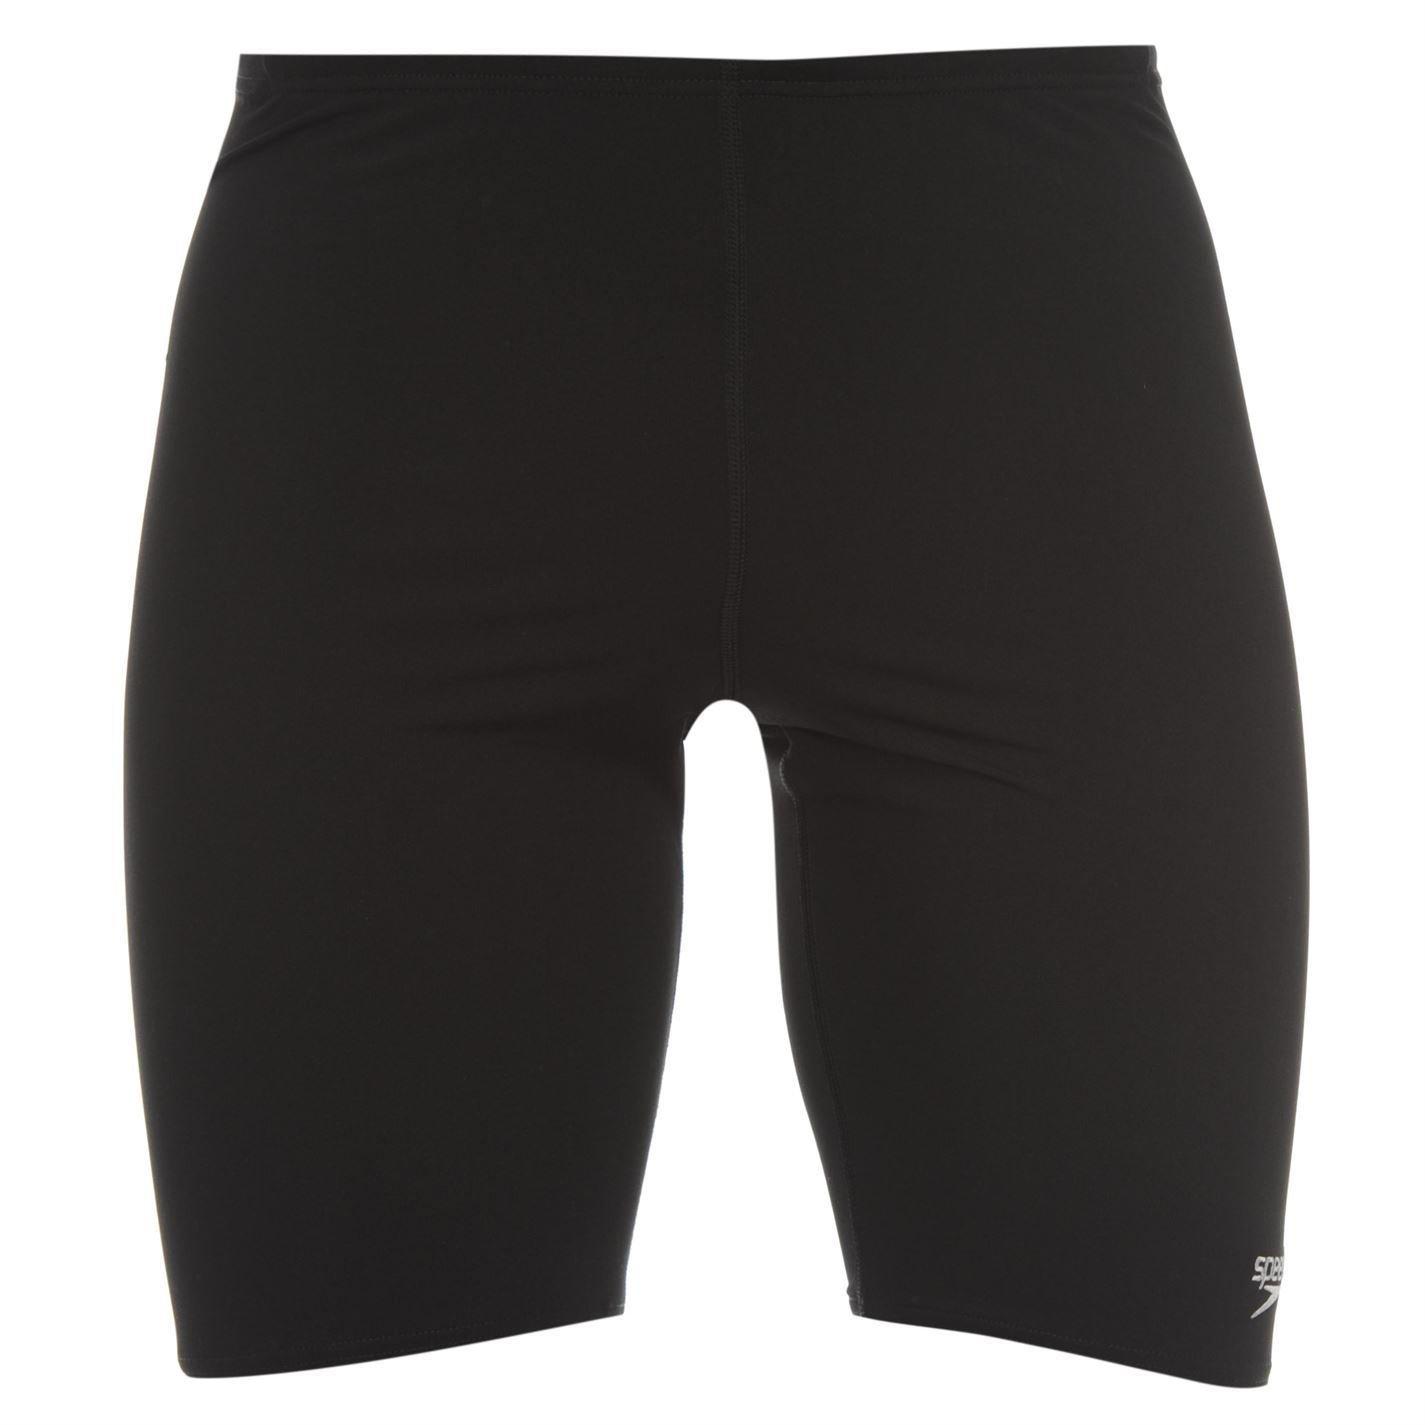 Speedo Mens End+ Jam Swimming Jammers Shorts Trunks Swimwear Sports Clothing